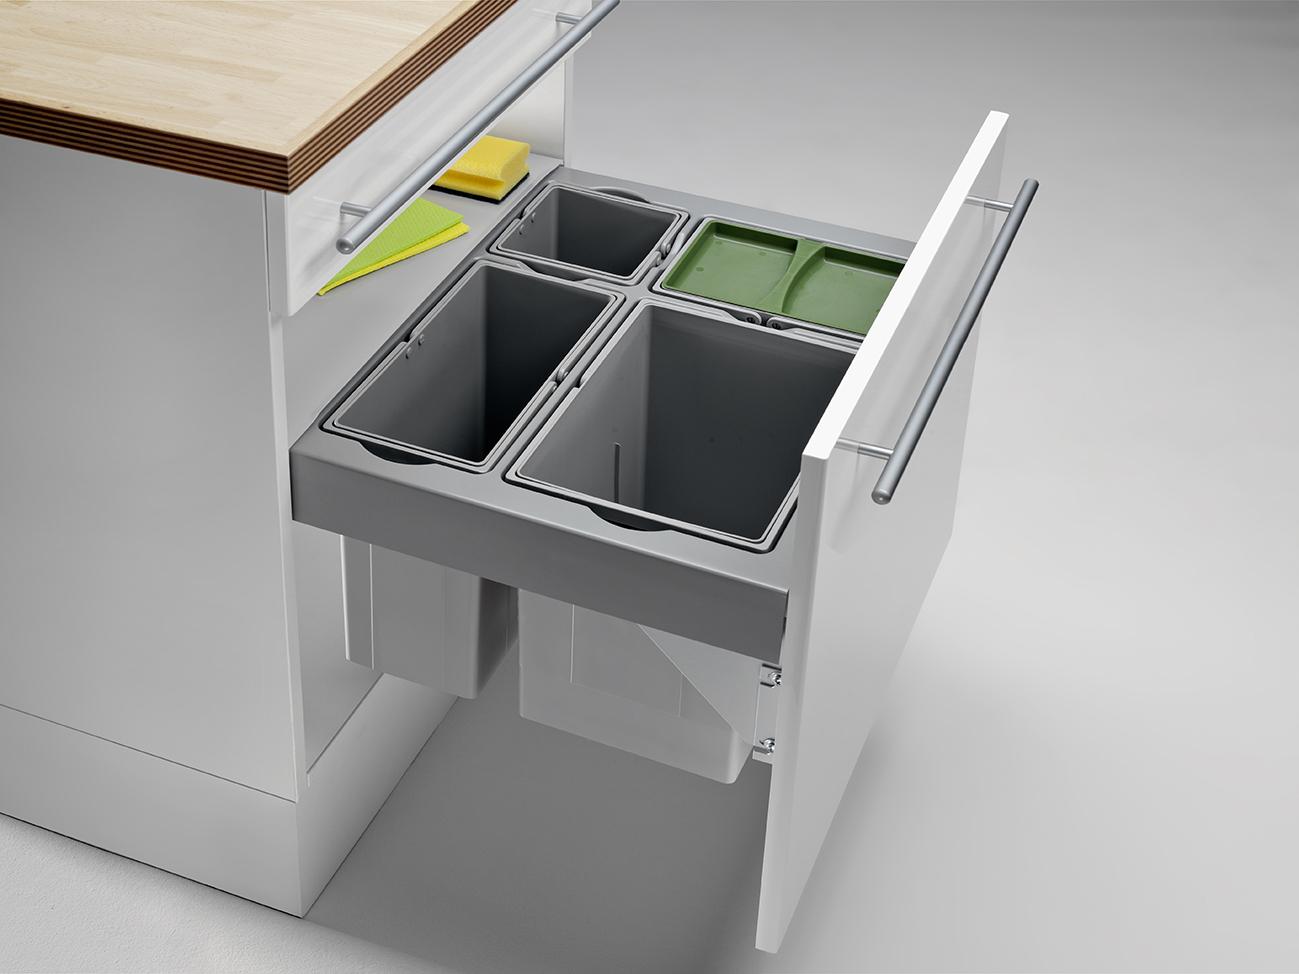 Abfallsysteme Küche ~ Home Design Ideen